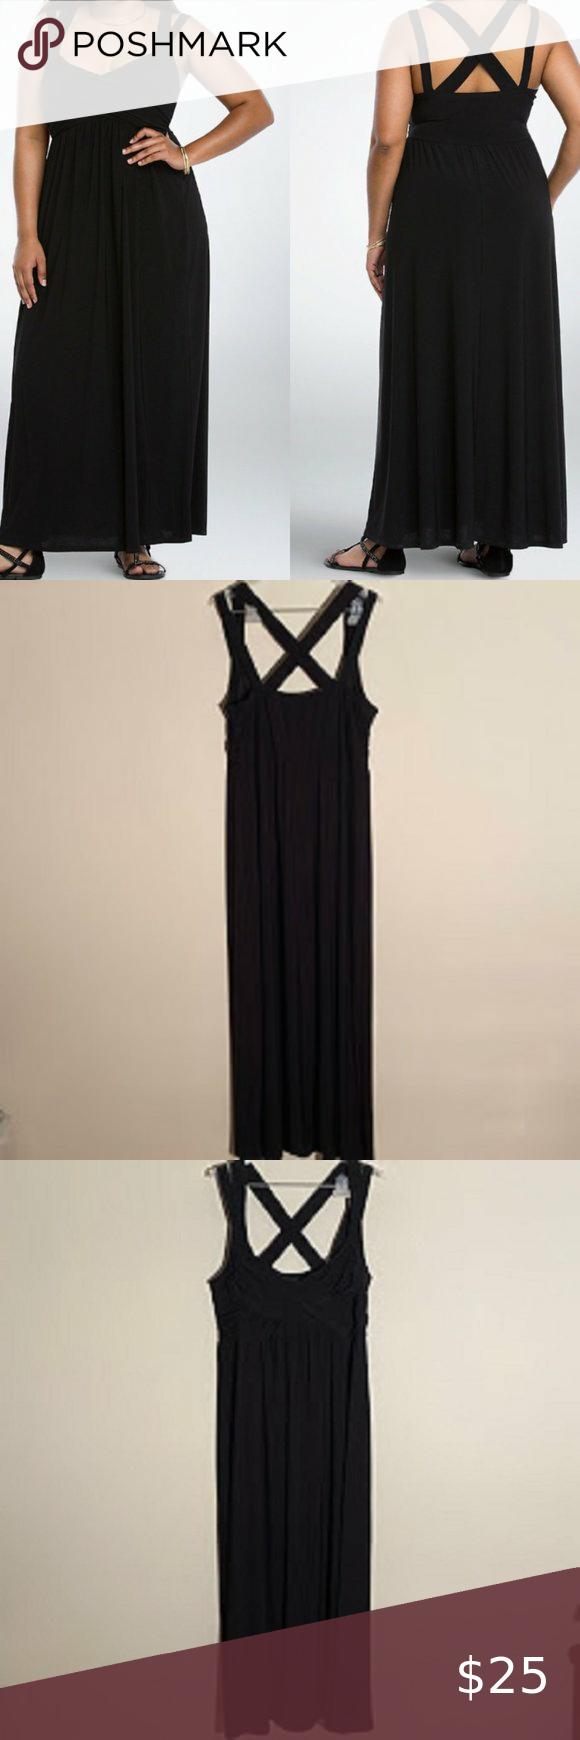 Torrid Black Plus Crisscross Maxi Dress 2x Dresses 2x Maxi Dress Dresses [ 1740 x 580 Pixel ]